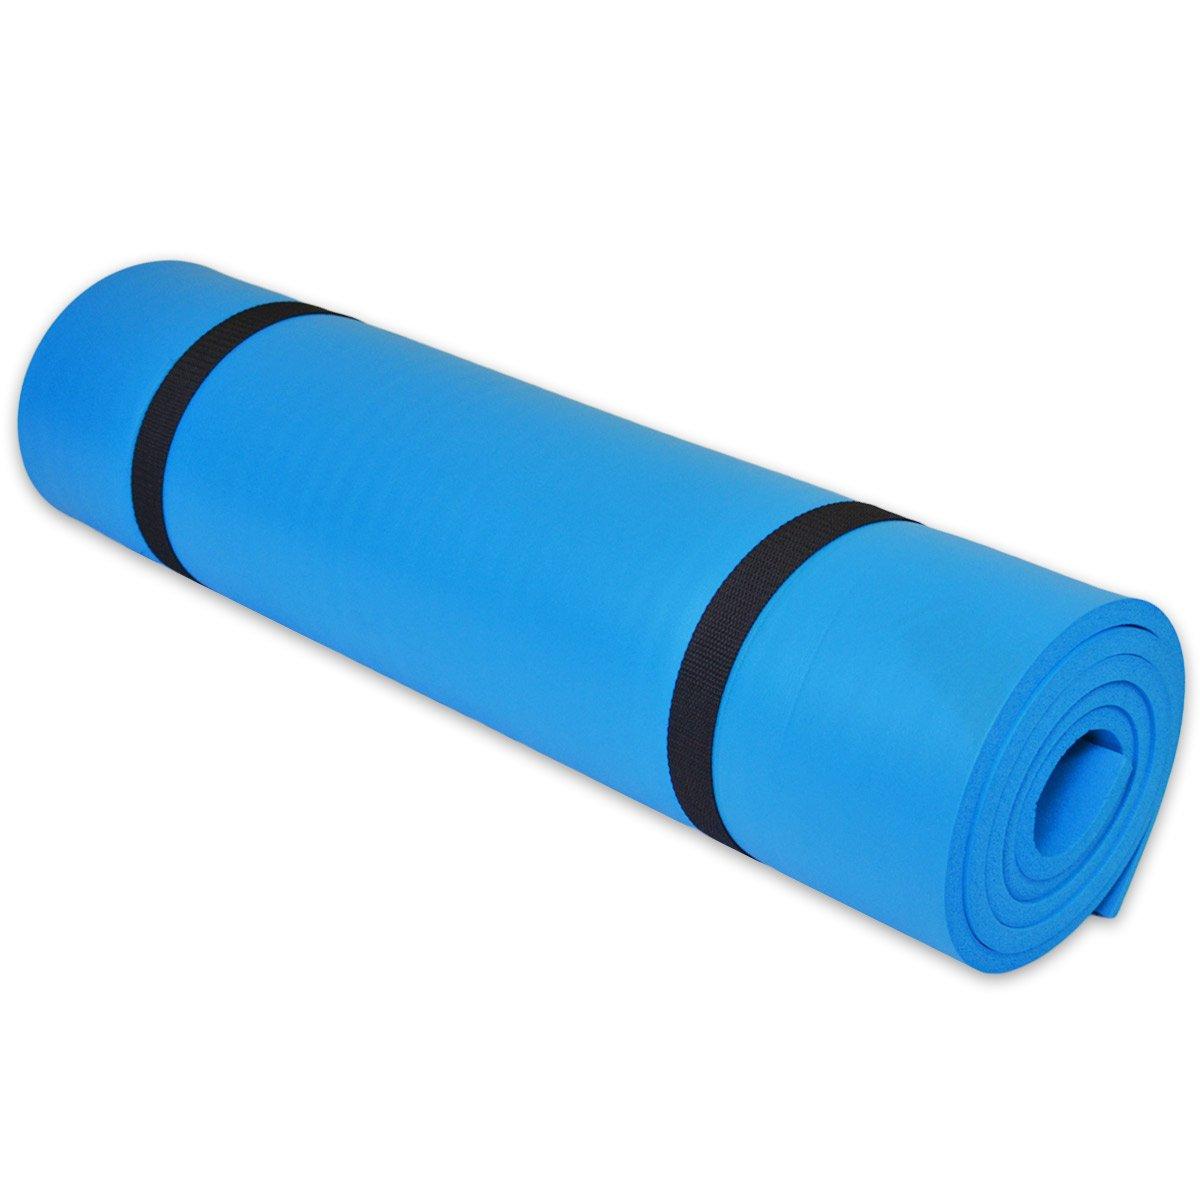 YOGA Accessories 3 8 Pilates Aero Yoga Mat